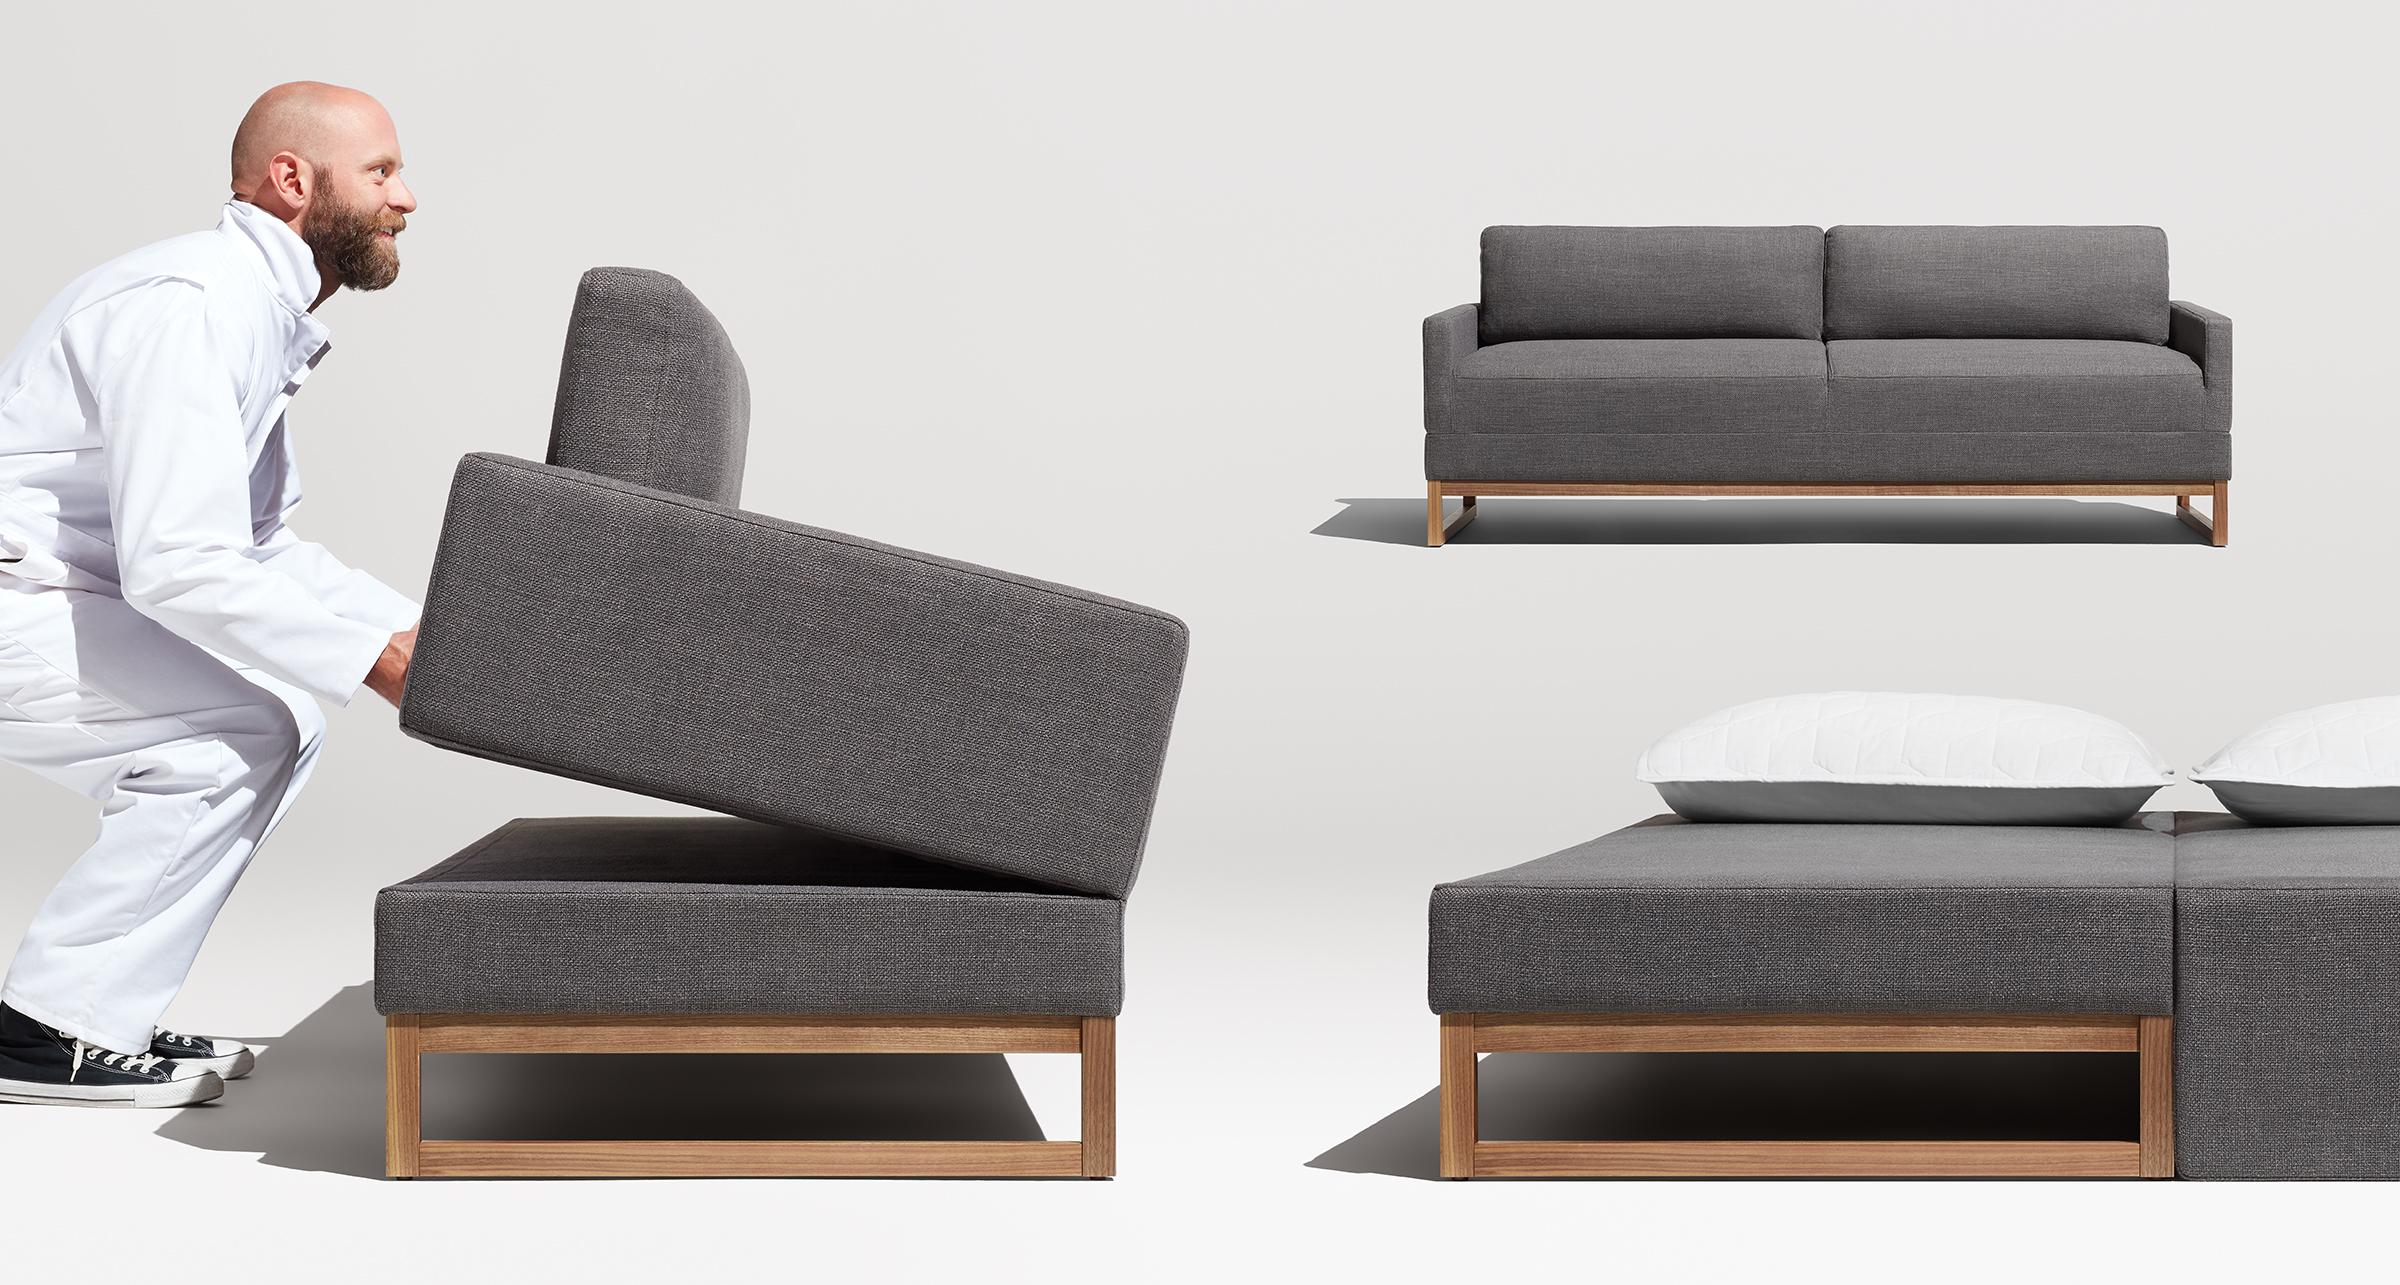 sleeper sofa diplomat 80 OMTWKDM